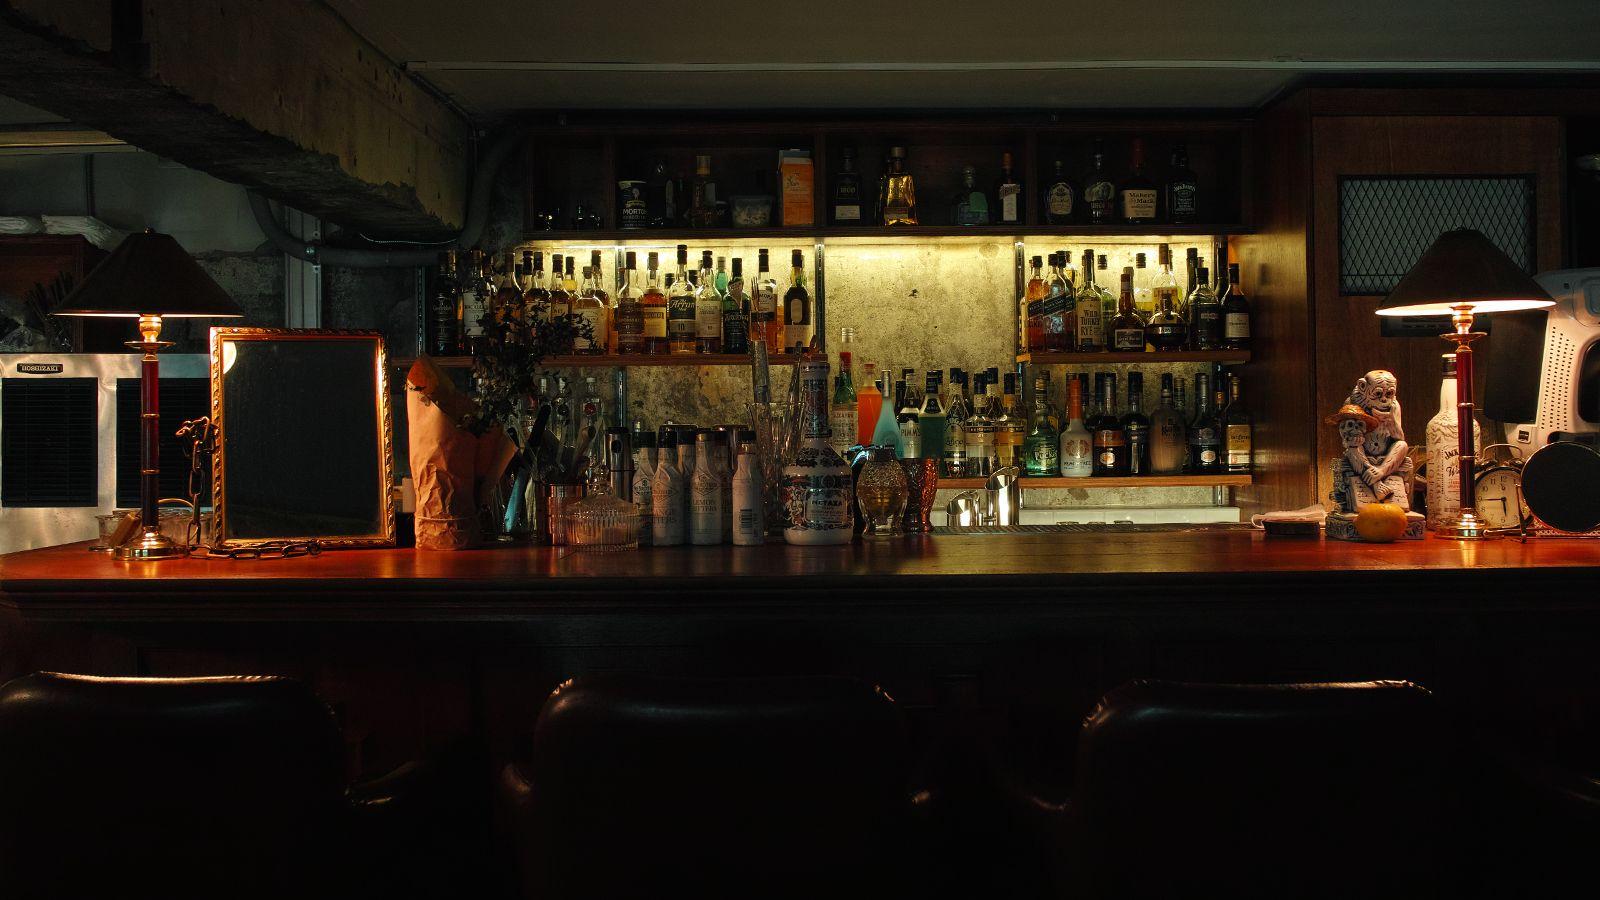 .. ... .. #232seoul #232 #isami #bar #Itaewon #cafe #coffee #cocktail #칵테일 #바 #hannam #한남 #커피 #카페 #二三二 #seoul #korea #이태원 #bar #이삼이 #빈티지 #vintage #한남동 #술